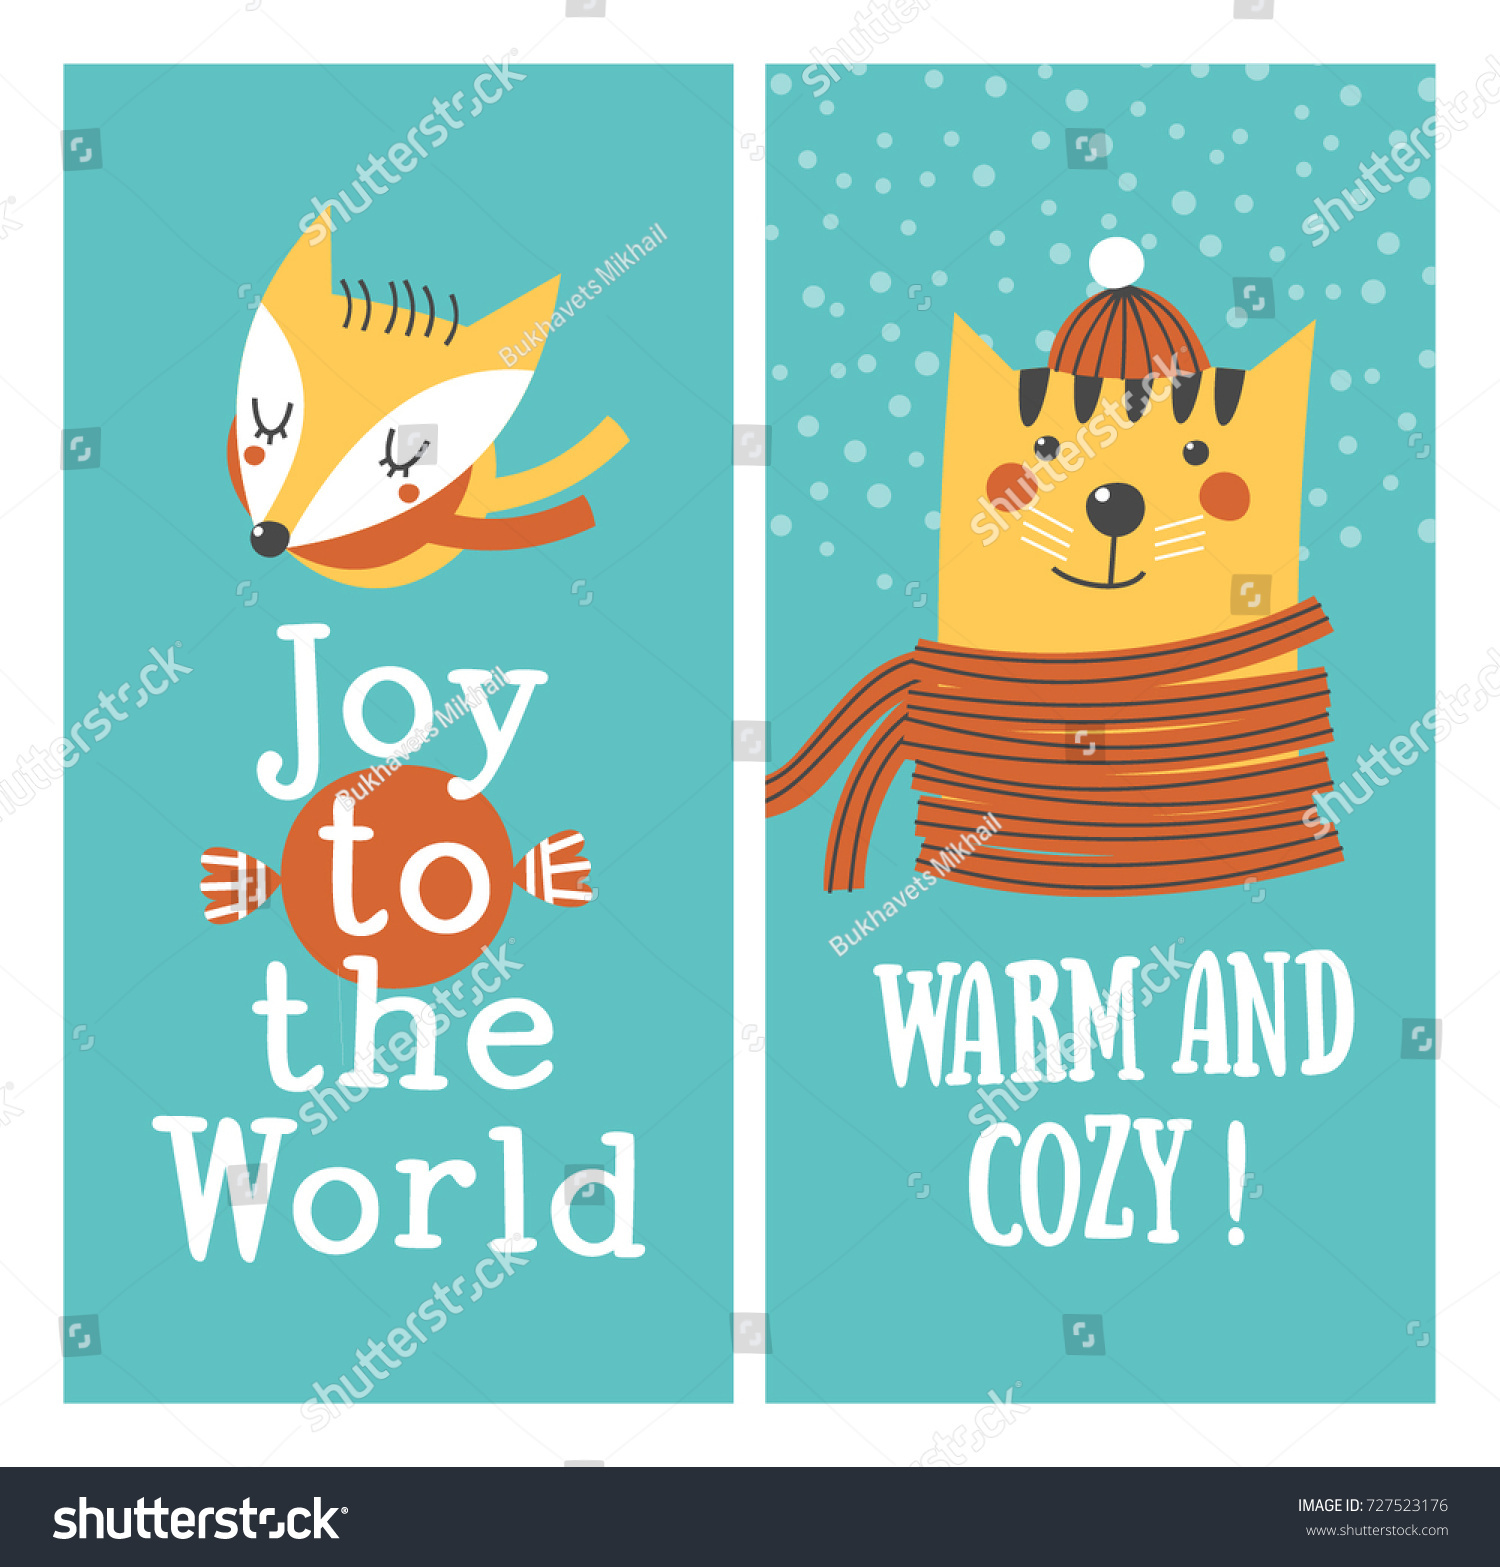 Holiday cards warm cozy joy world stock vector 727523176 holiday cards warm and cozy joy to the world kristyandbryce Gallery